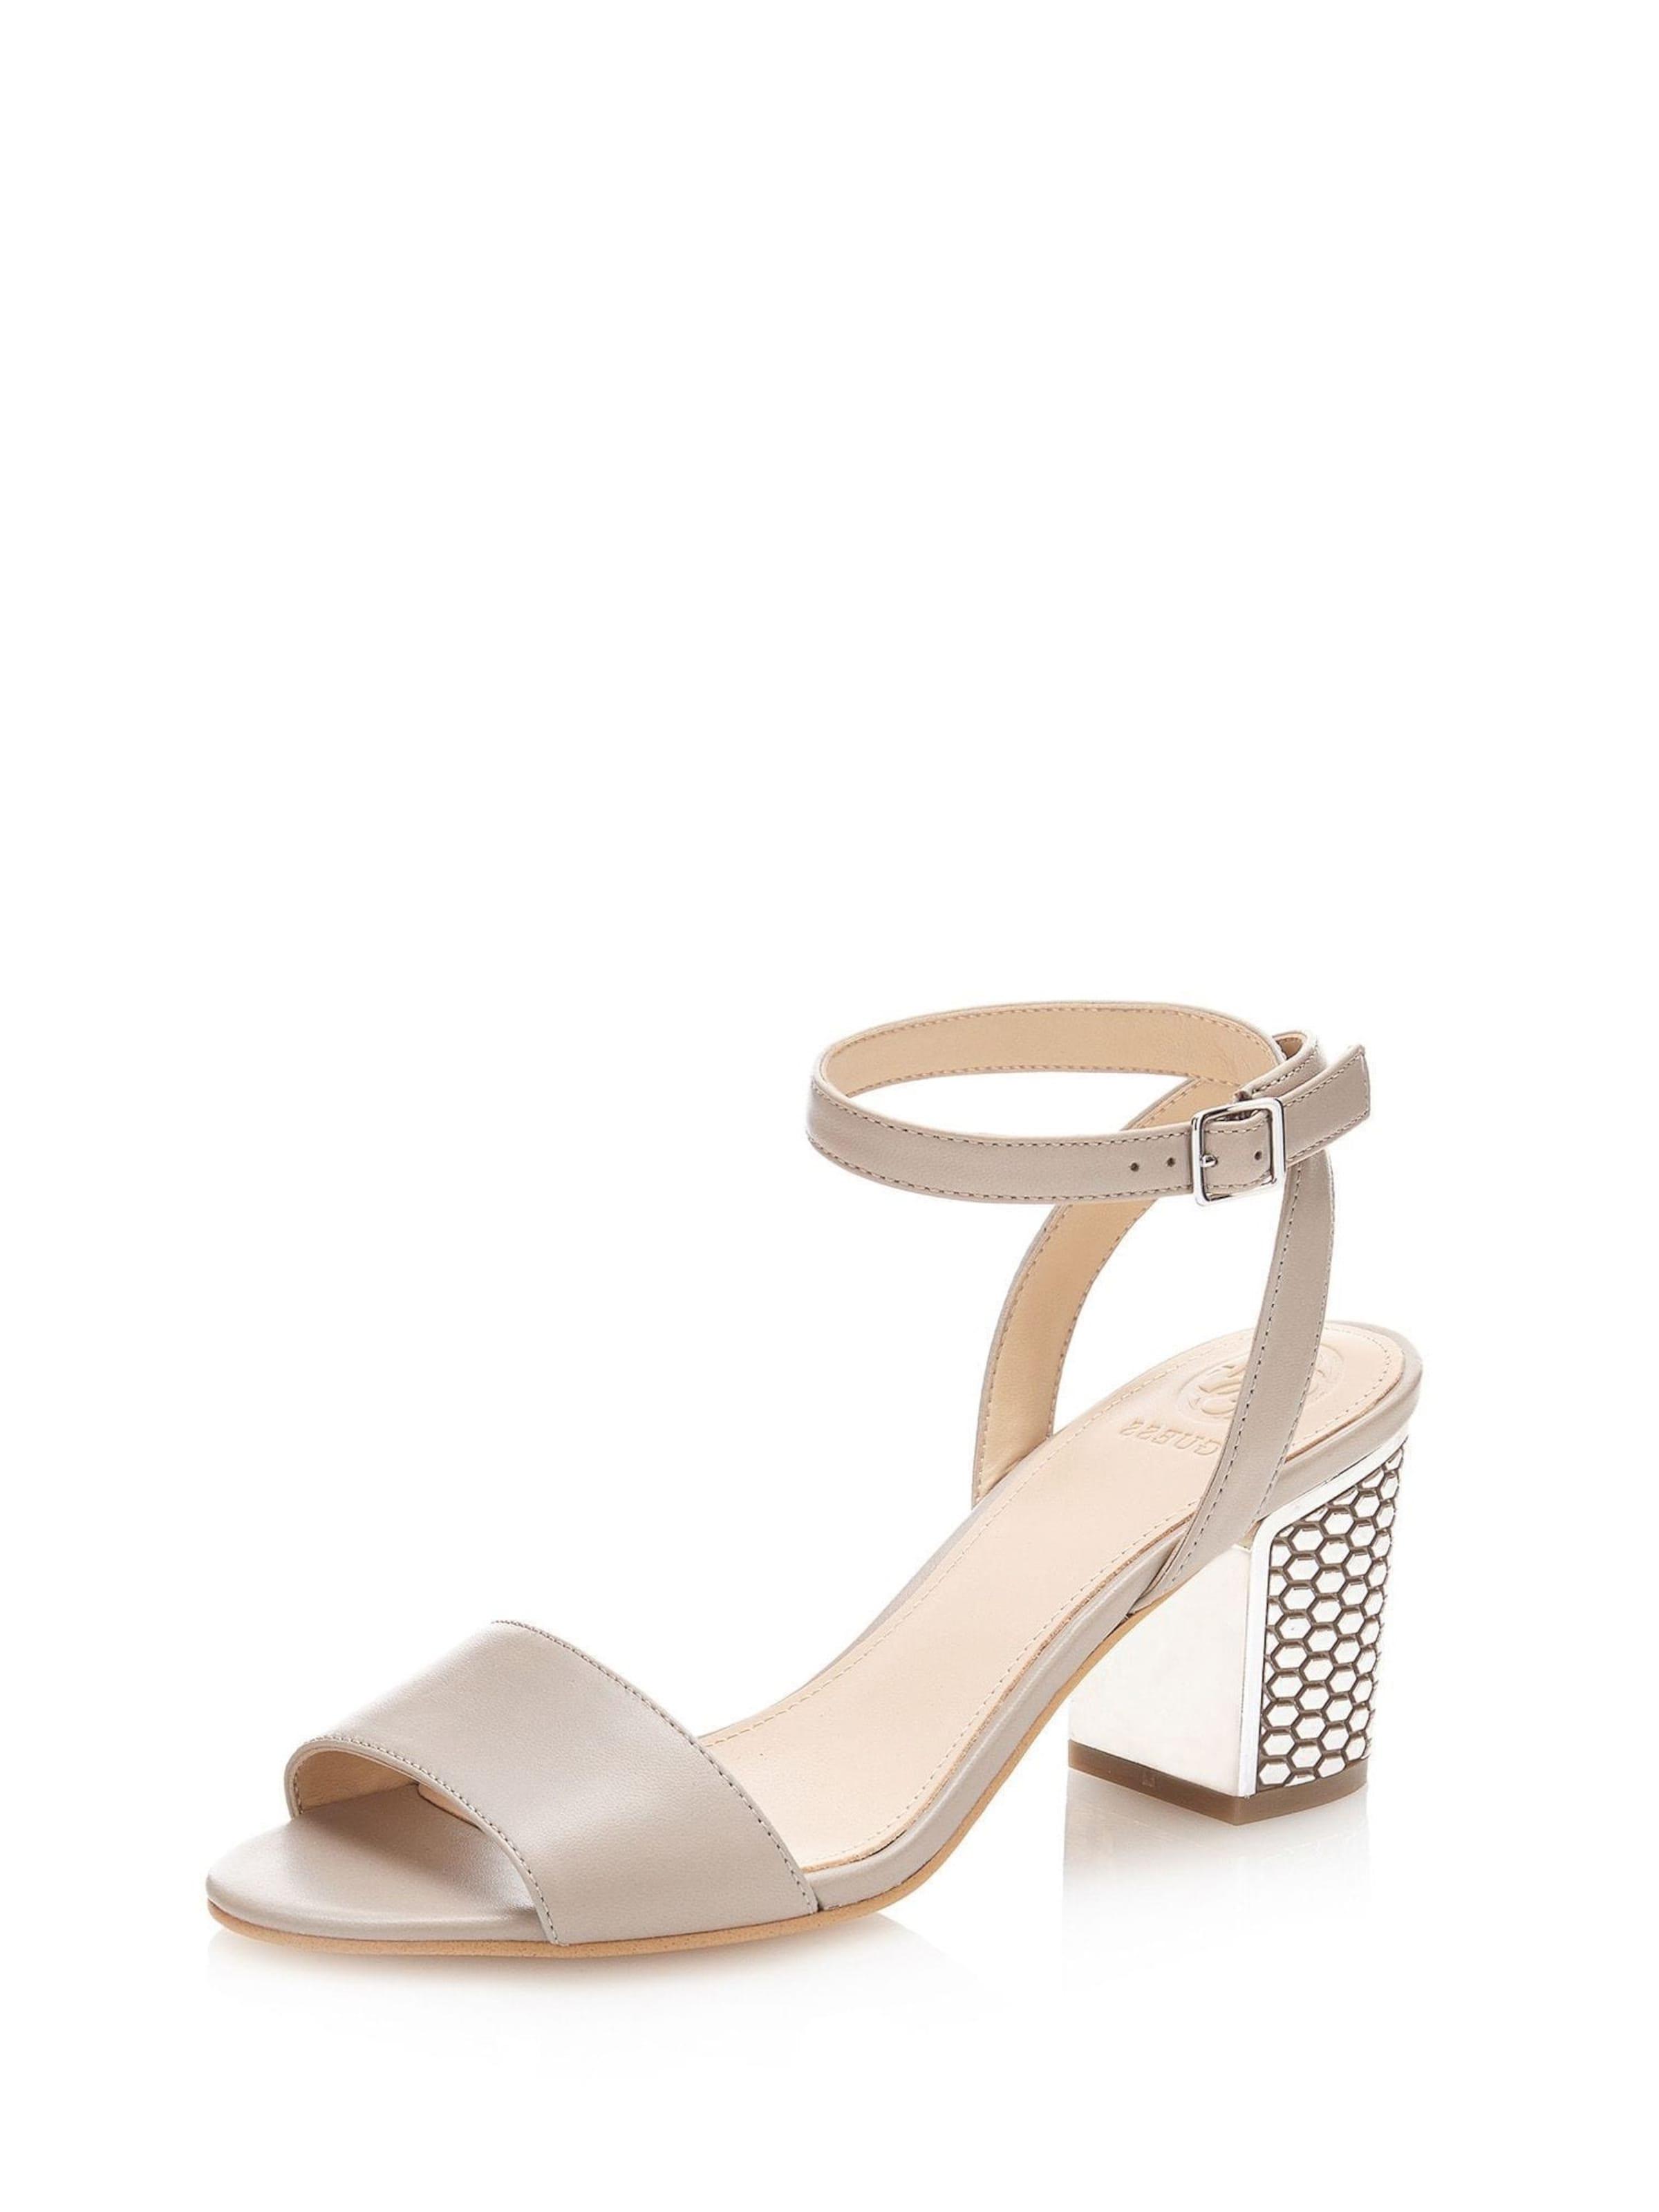 GUESS SANDALETTE RENEE Verschleißfeste billige Schuhe